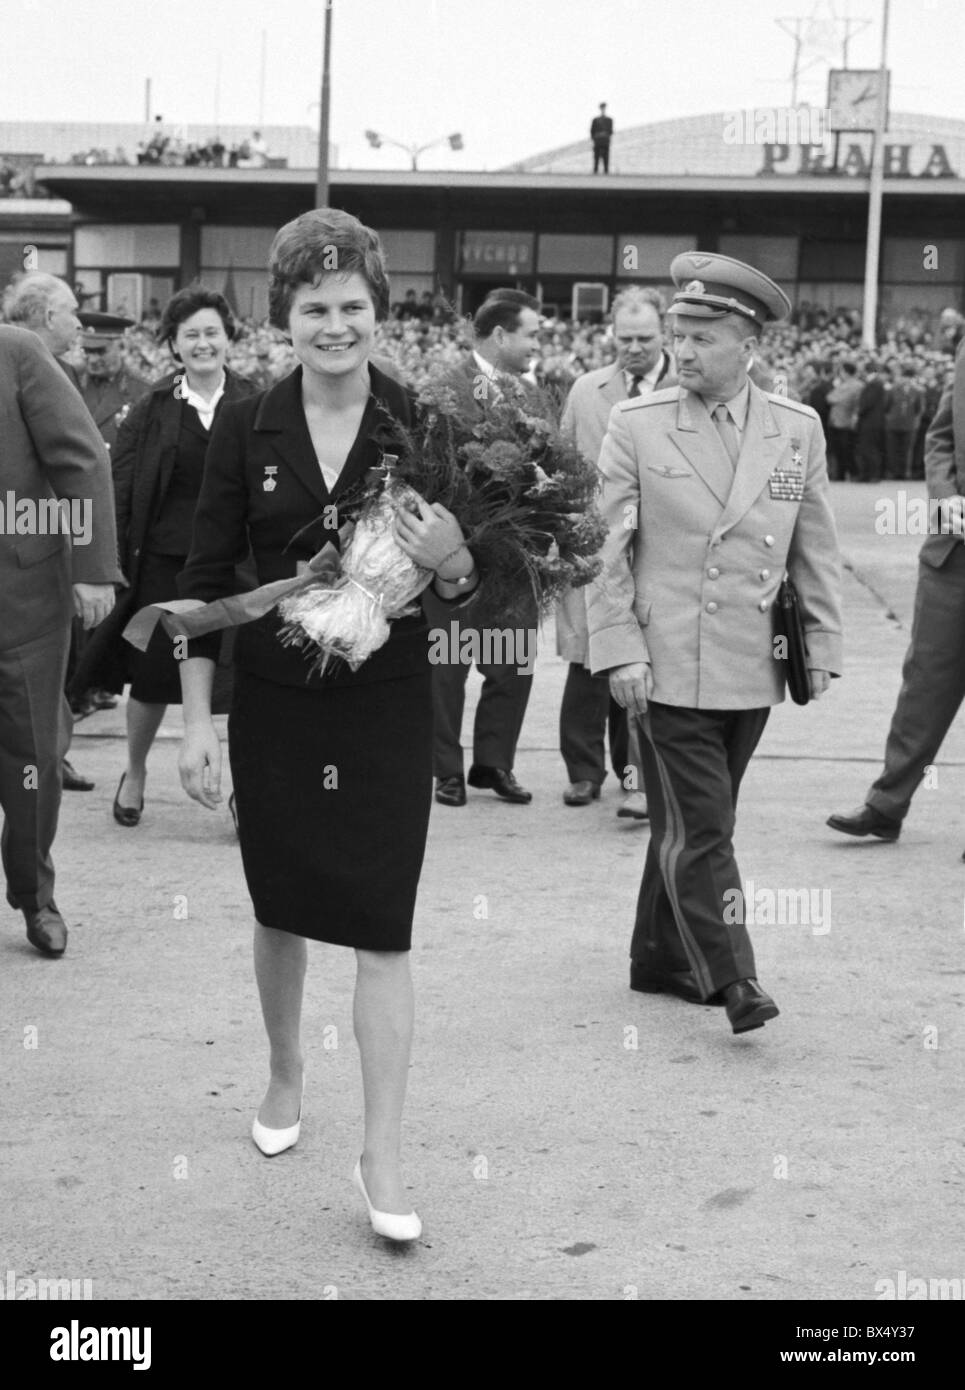 First woman in space, Soviet astronaut Valentina Tereskovova,  in Prague, Czechoslovakia 1963. (CTK Photo) - Stock Image